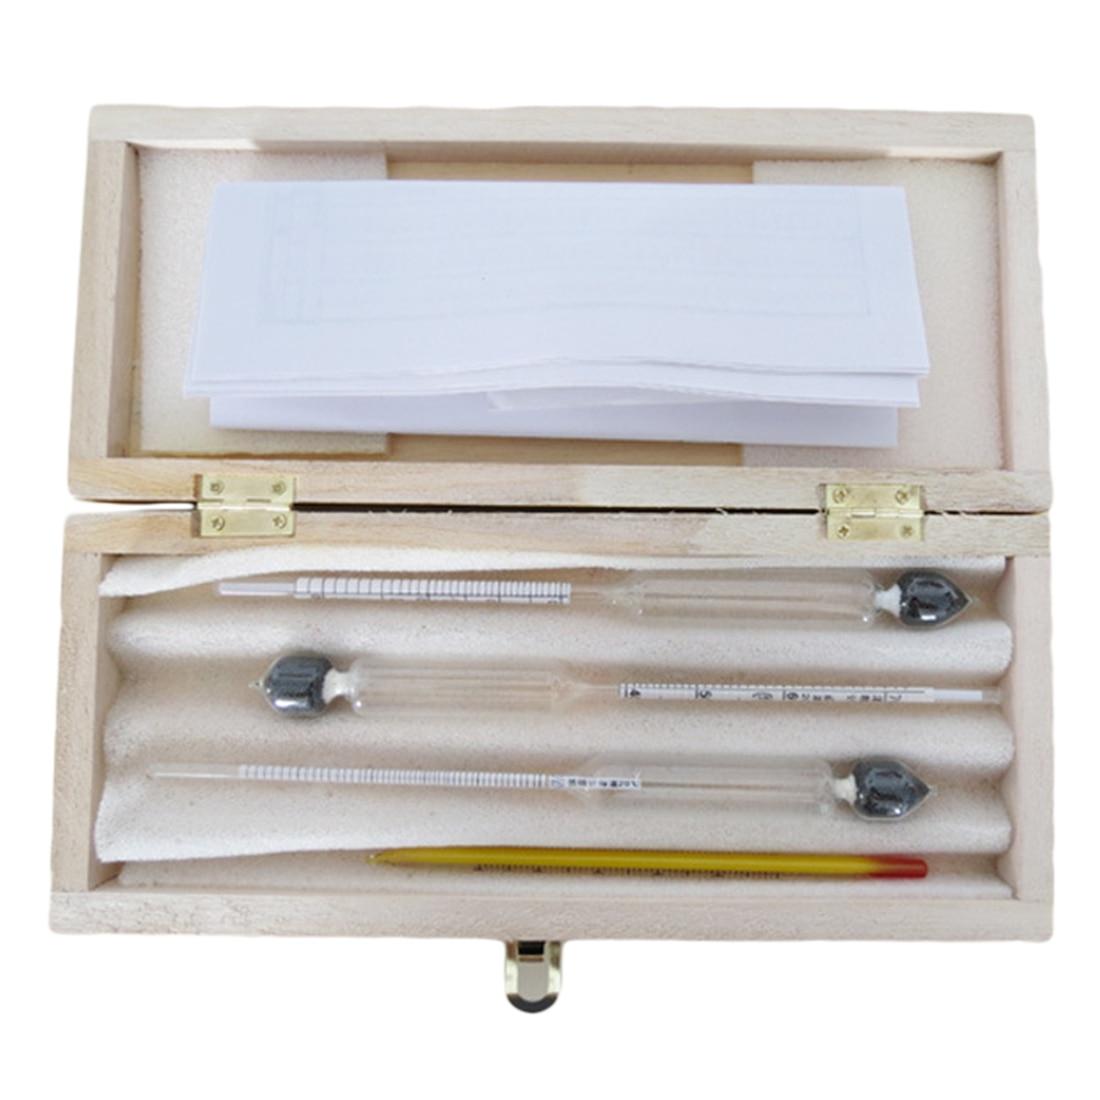 Caliente 3 unids/set vidrio alcoholímetro vino metros Alcohol concentración Alcohol instrumento hidrómetro probador